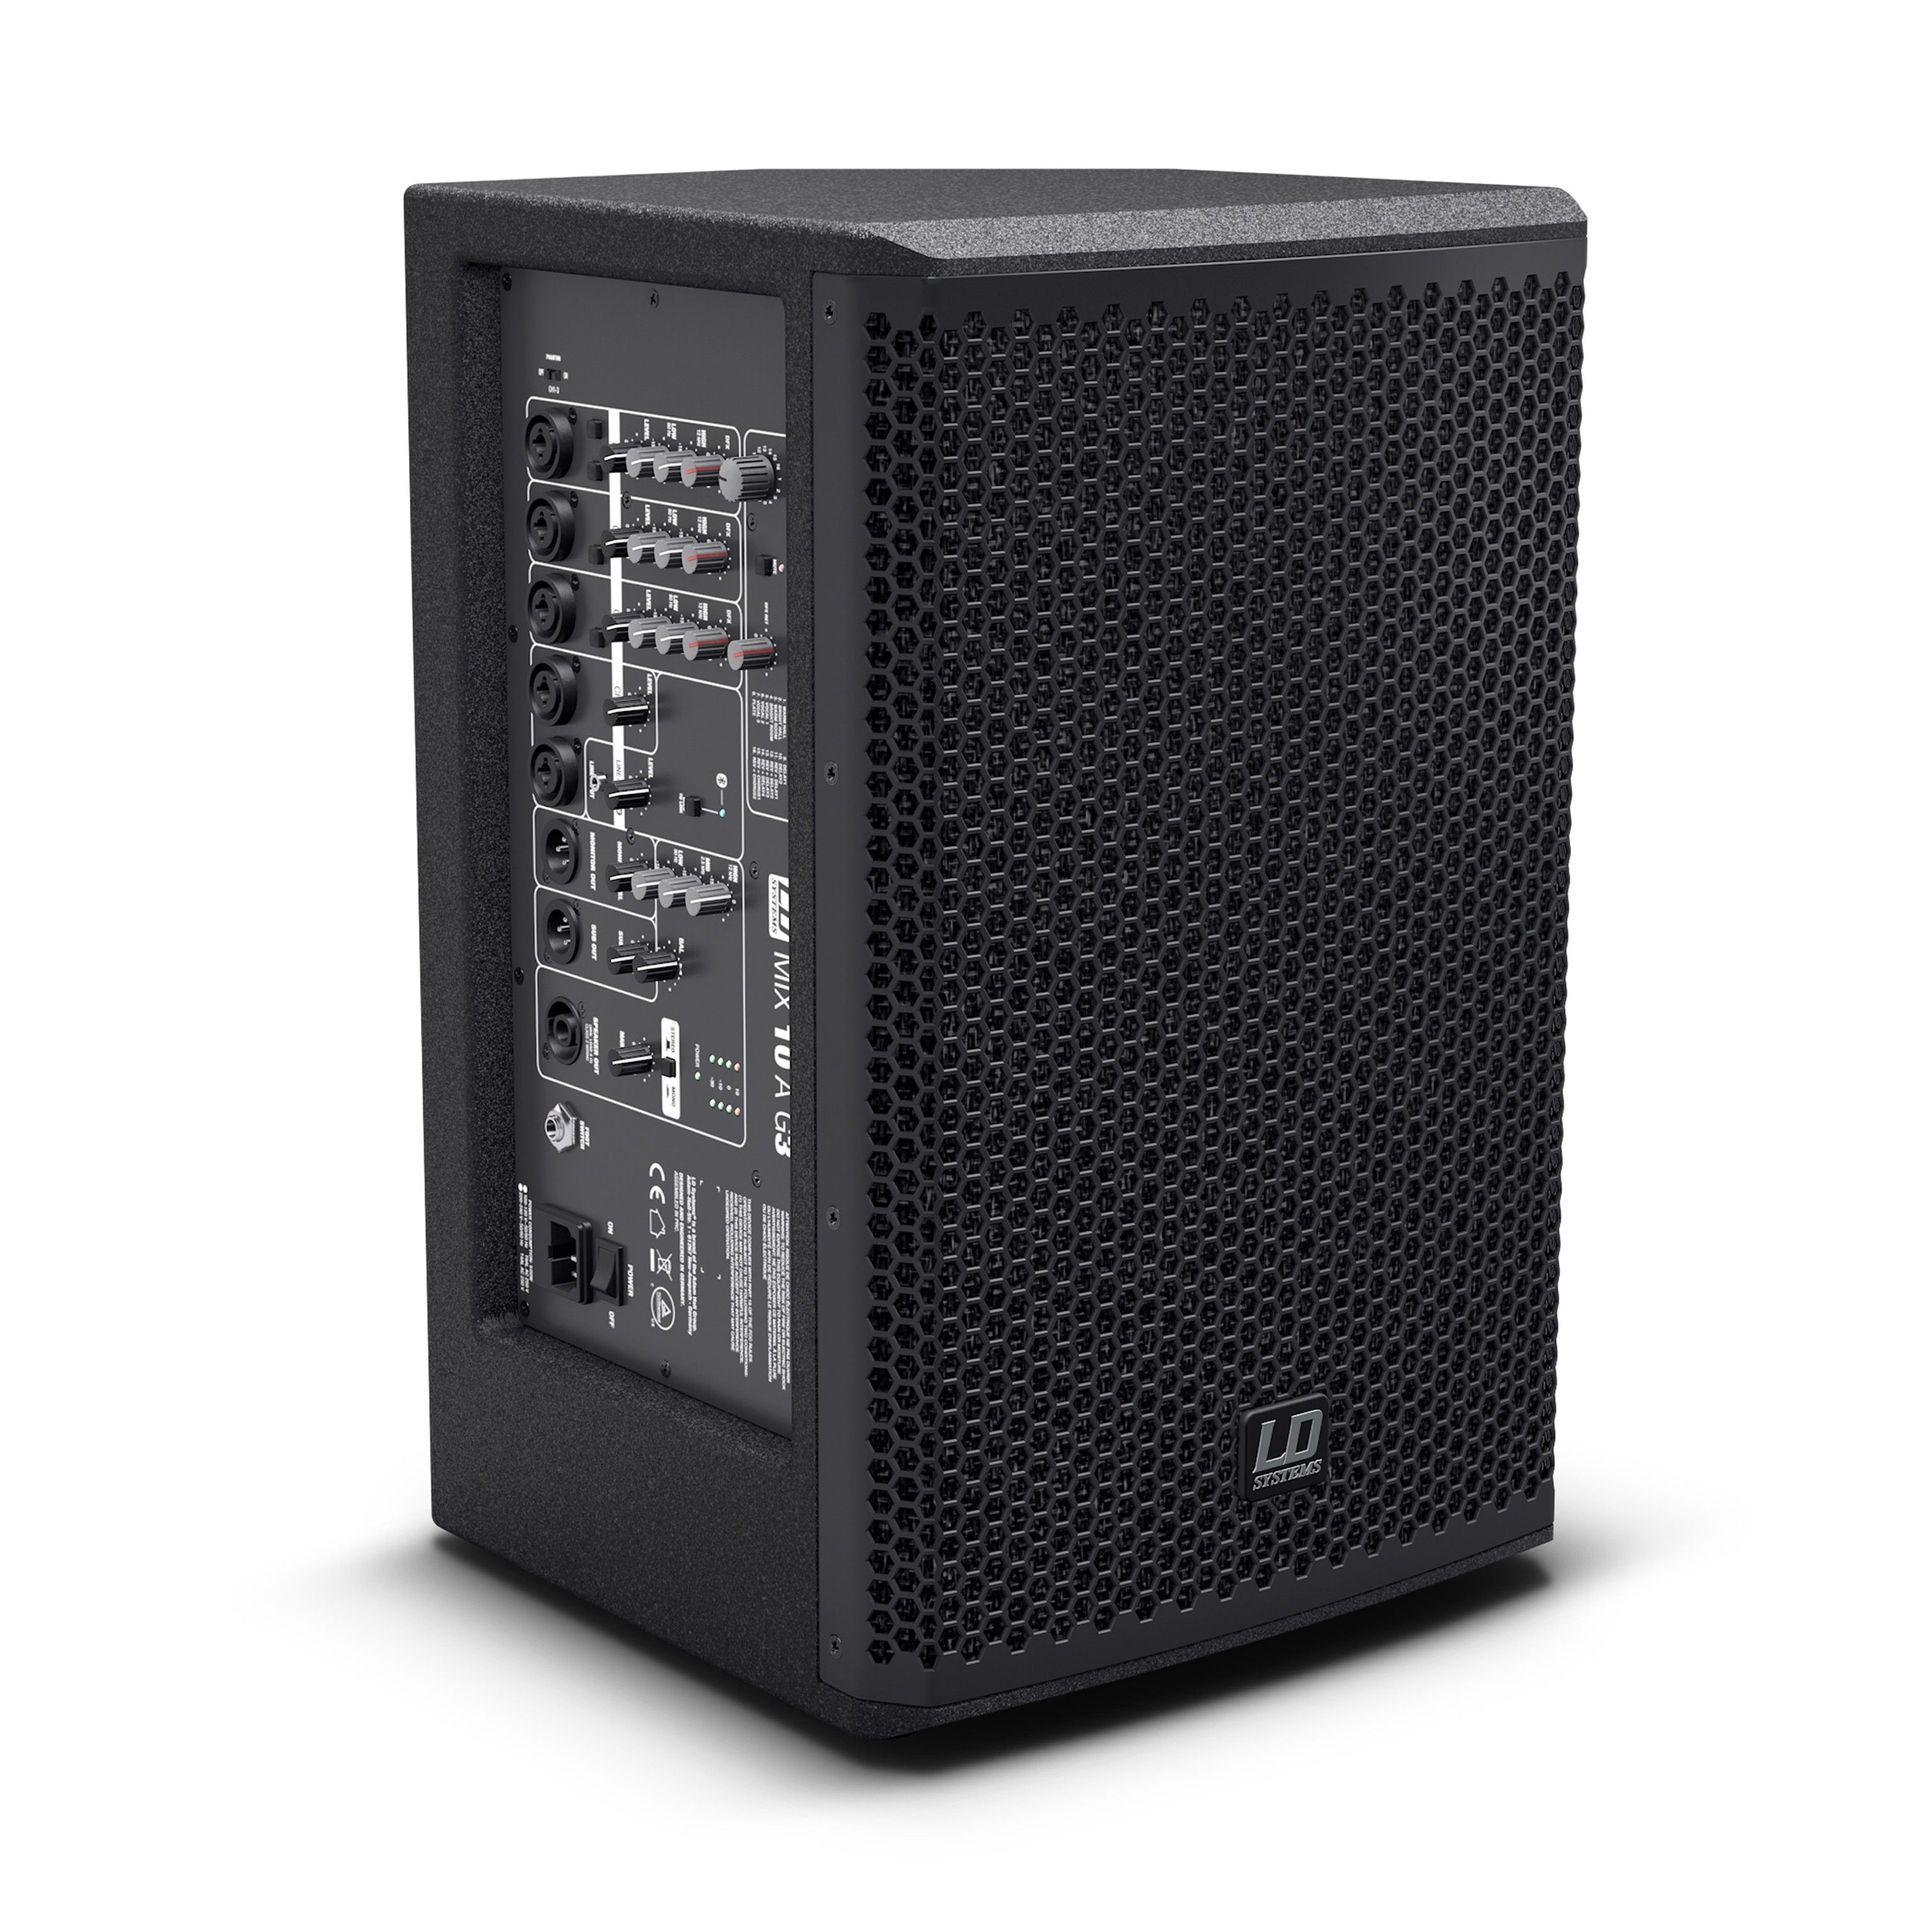 LD Systems Stinger MIX 10 A G3 aktive PA-Box mit 7-Kanal Mixer und Effekt